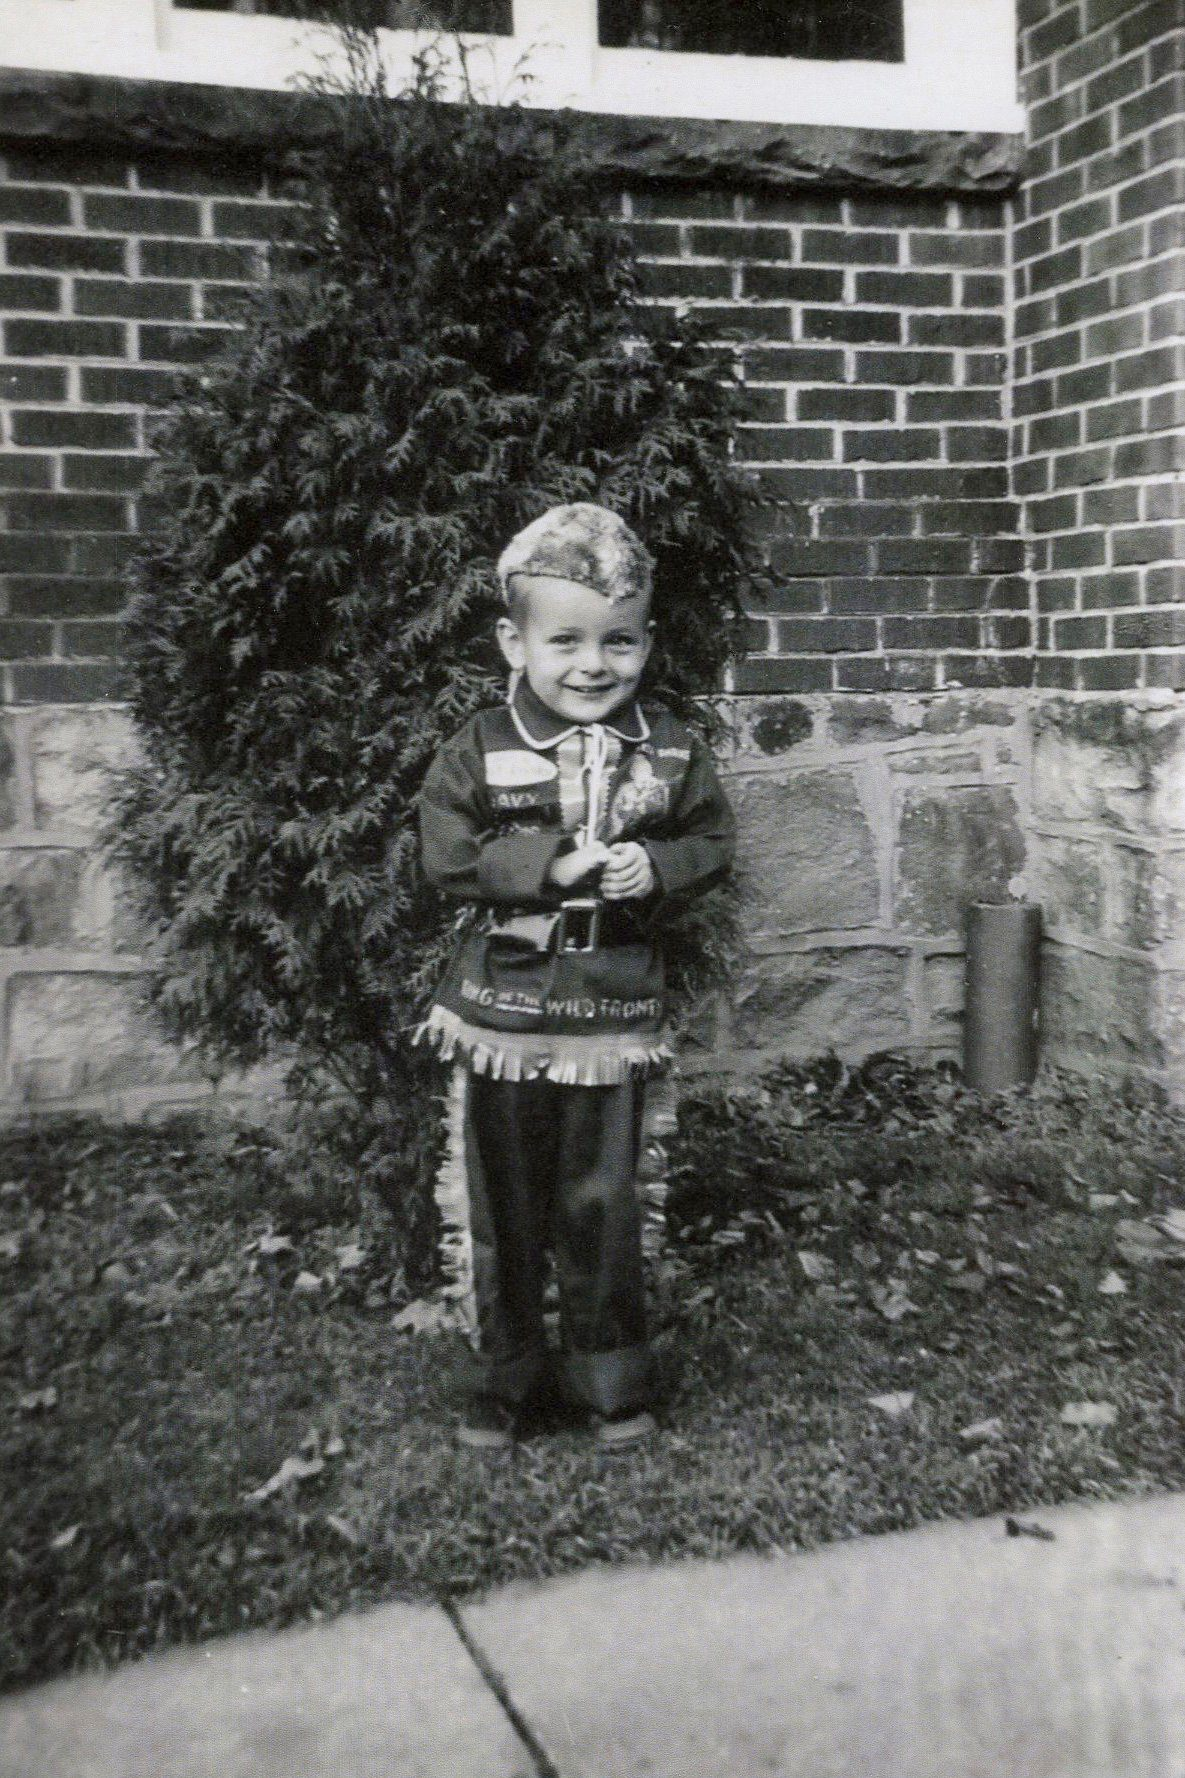 davey crockett vintage photo